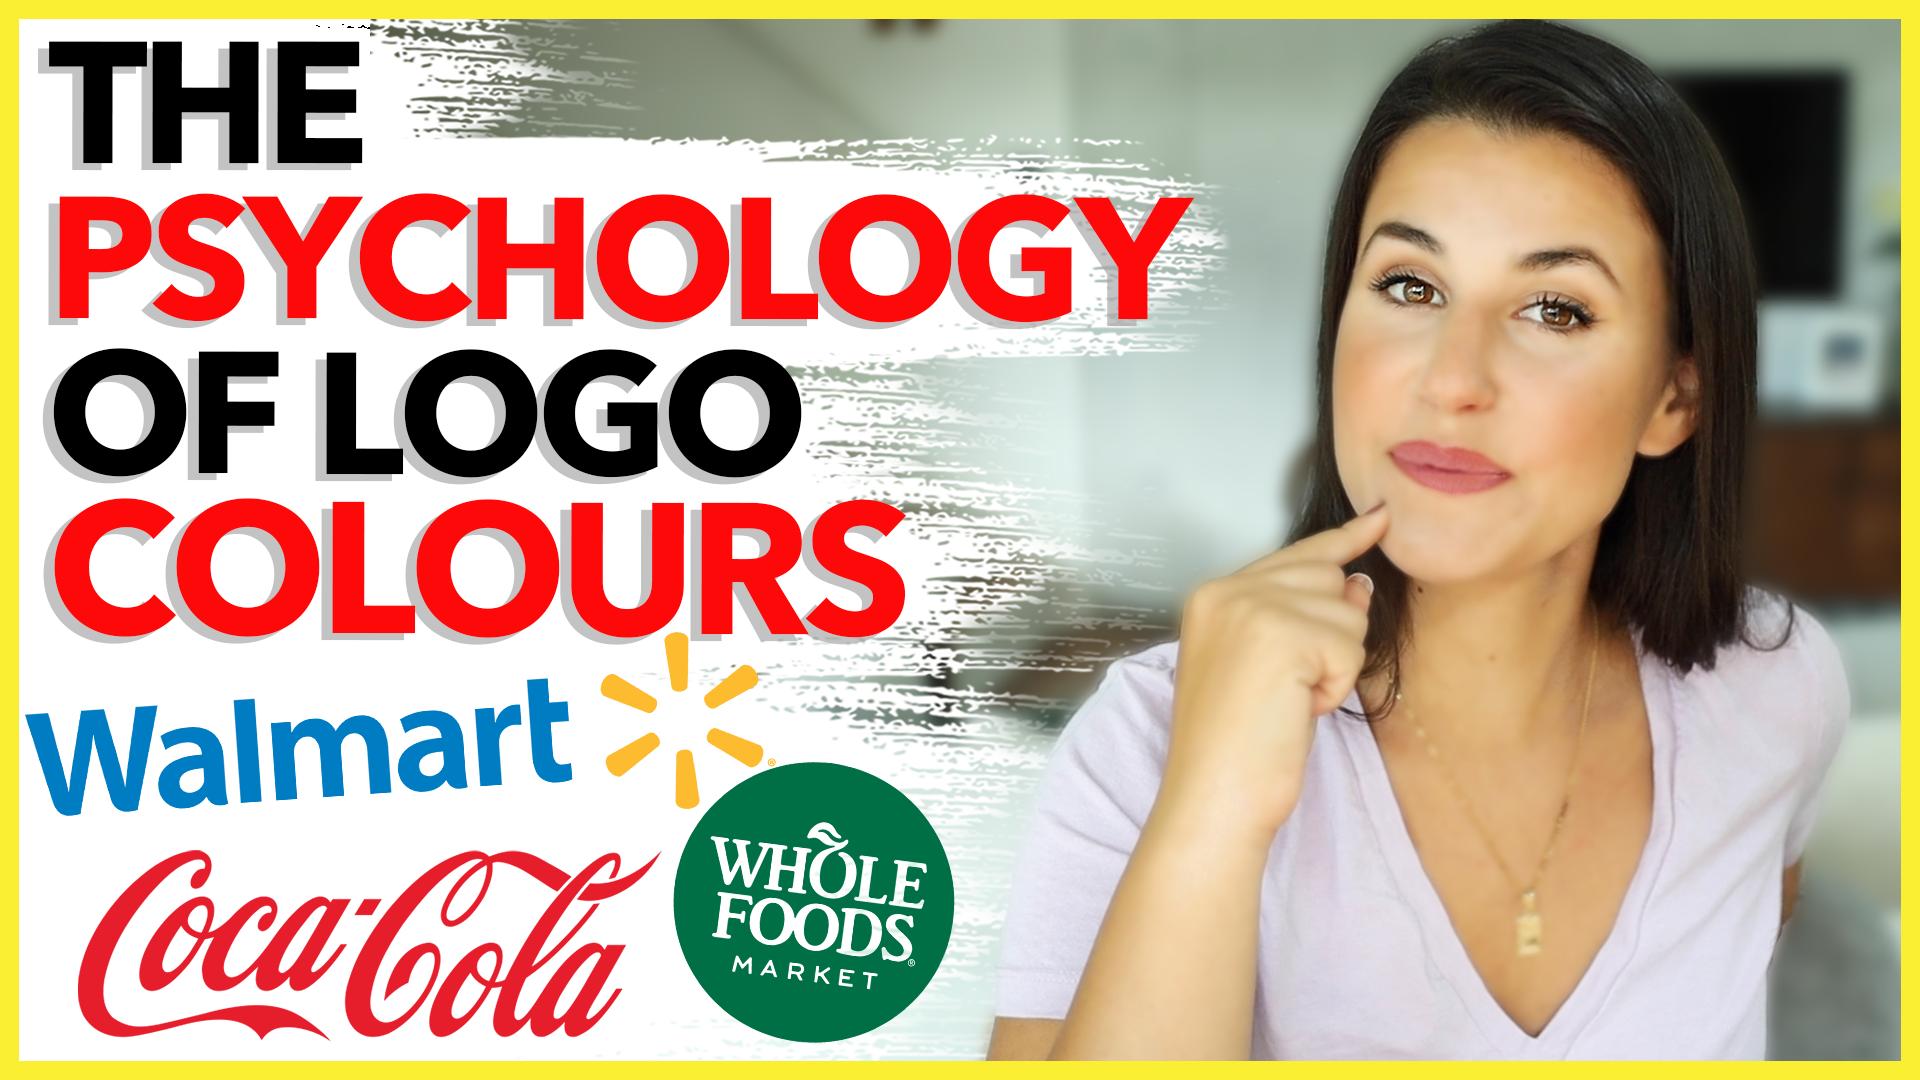 PSYCHOLOGY OF LOGO COLOURS